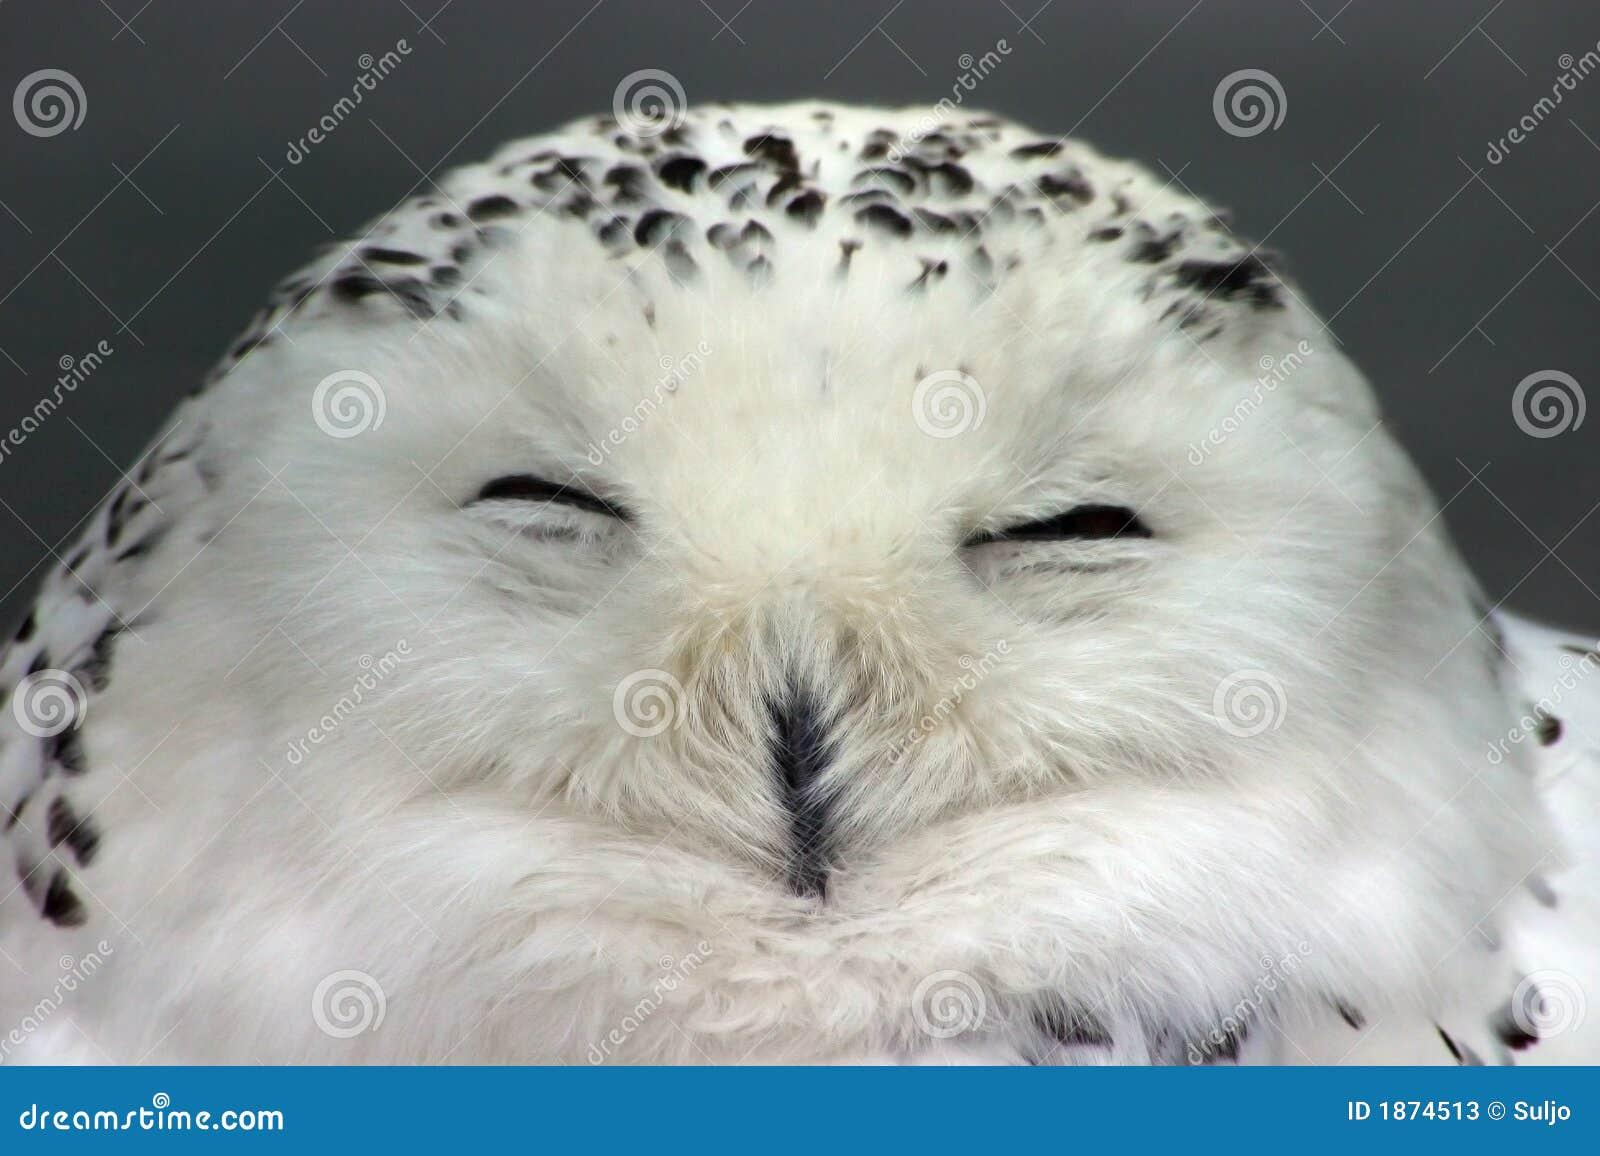 snow owl stock image image of yellow dreamy snow